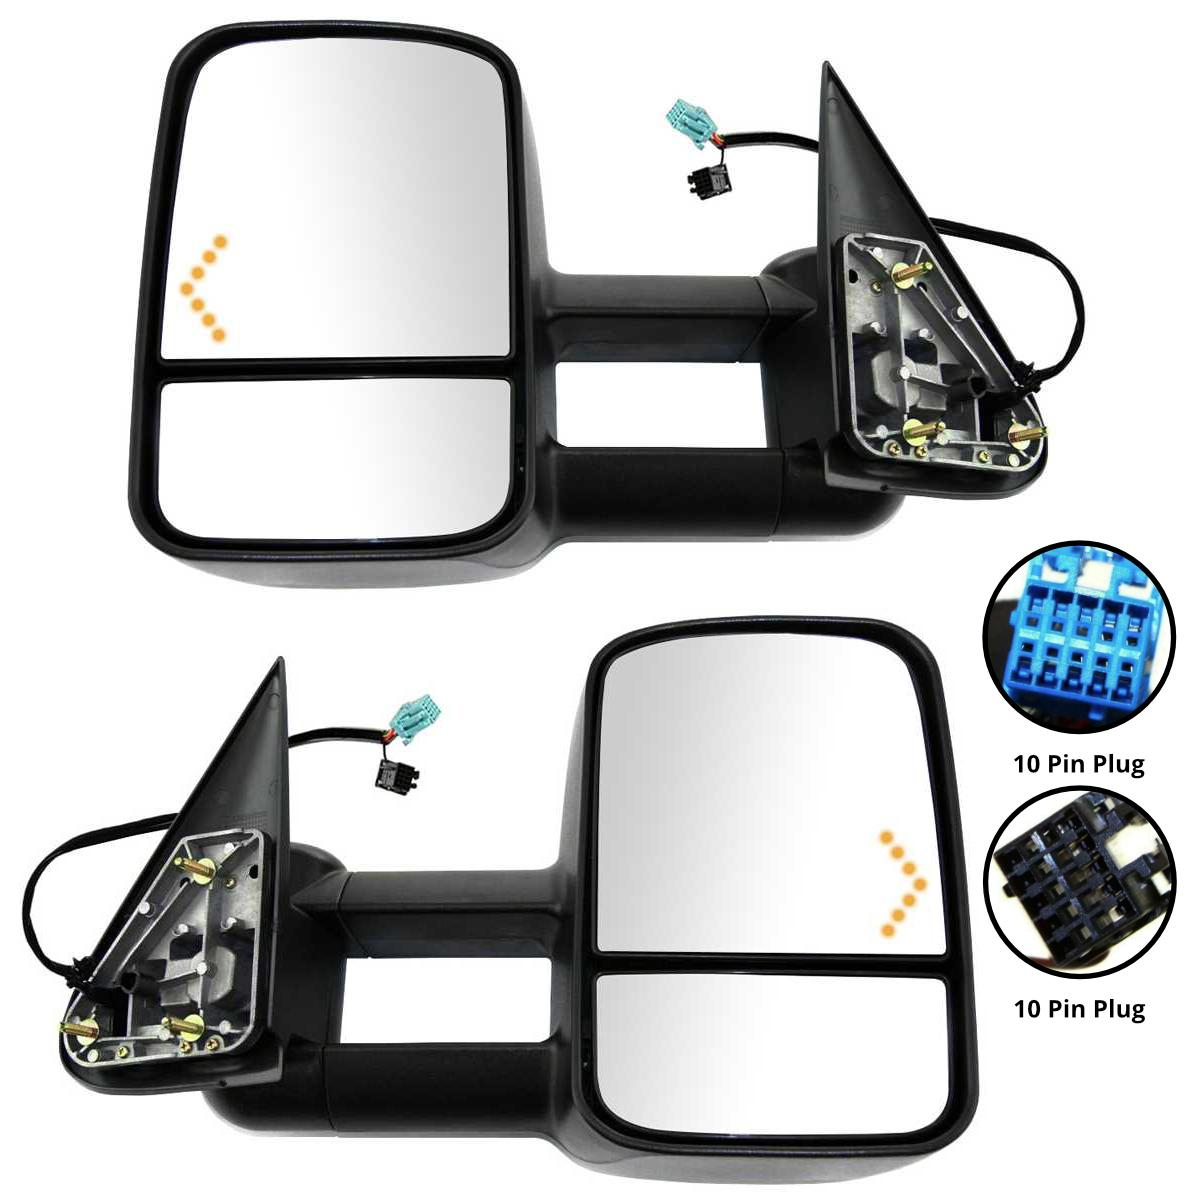 Pair-2-Power-Heated-Signal-Side-Mirror-Fits-2003-2006-Chevrolet-Silverado-1500